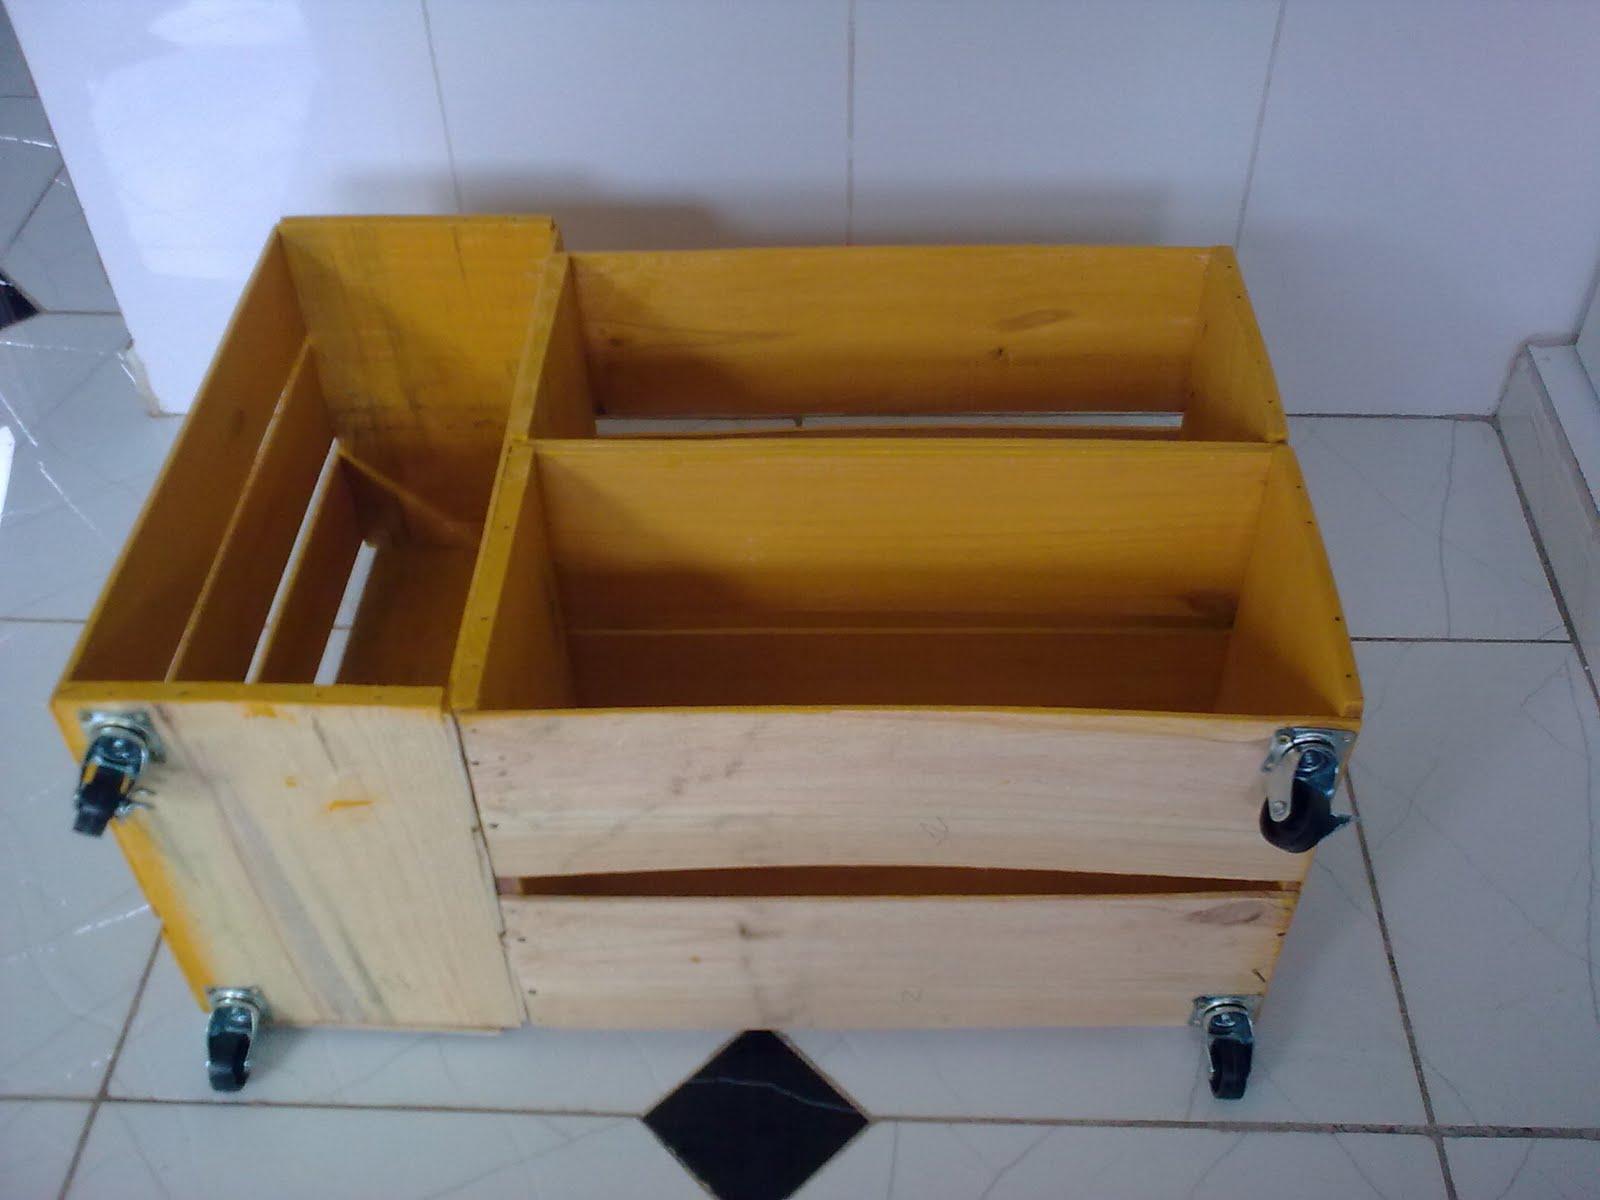 Kit Adesivo Joia De Unha ~ Lar Sempre Lar Um armário para meu banheiro